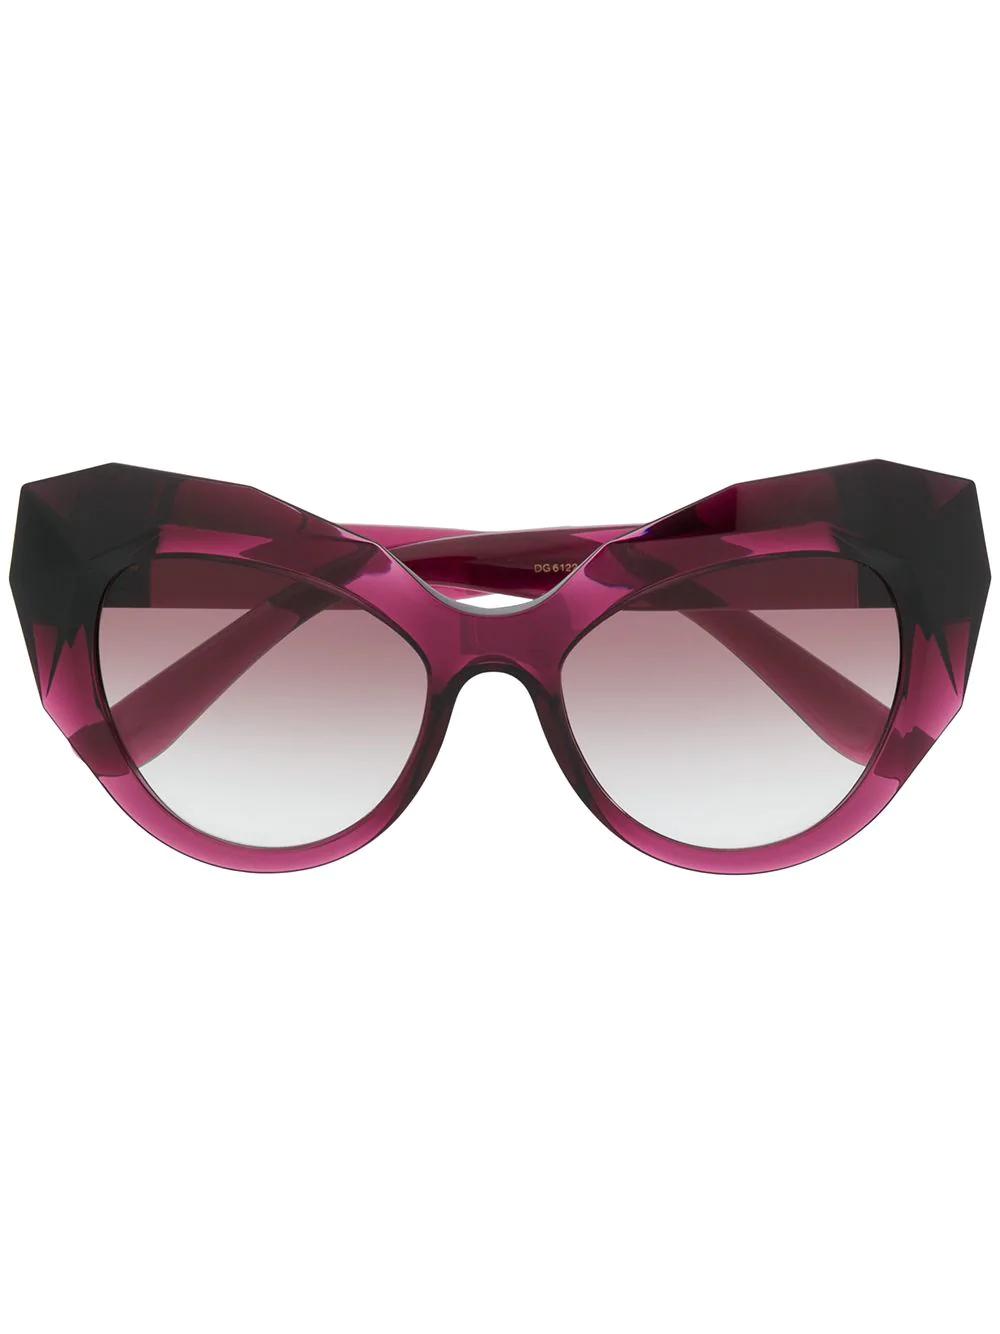 6509228f6705 Dolce   Gabbana Eyewear Oversized Cat Eye Sunglasses - Pink. Farfetch